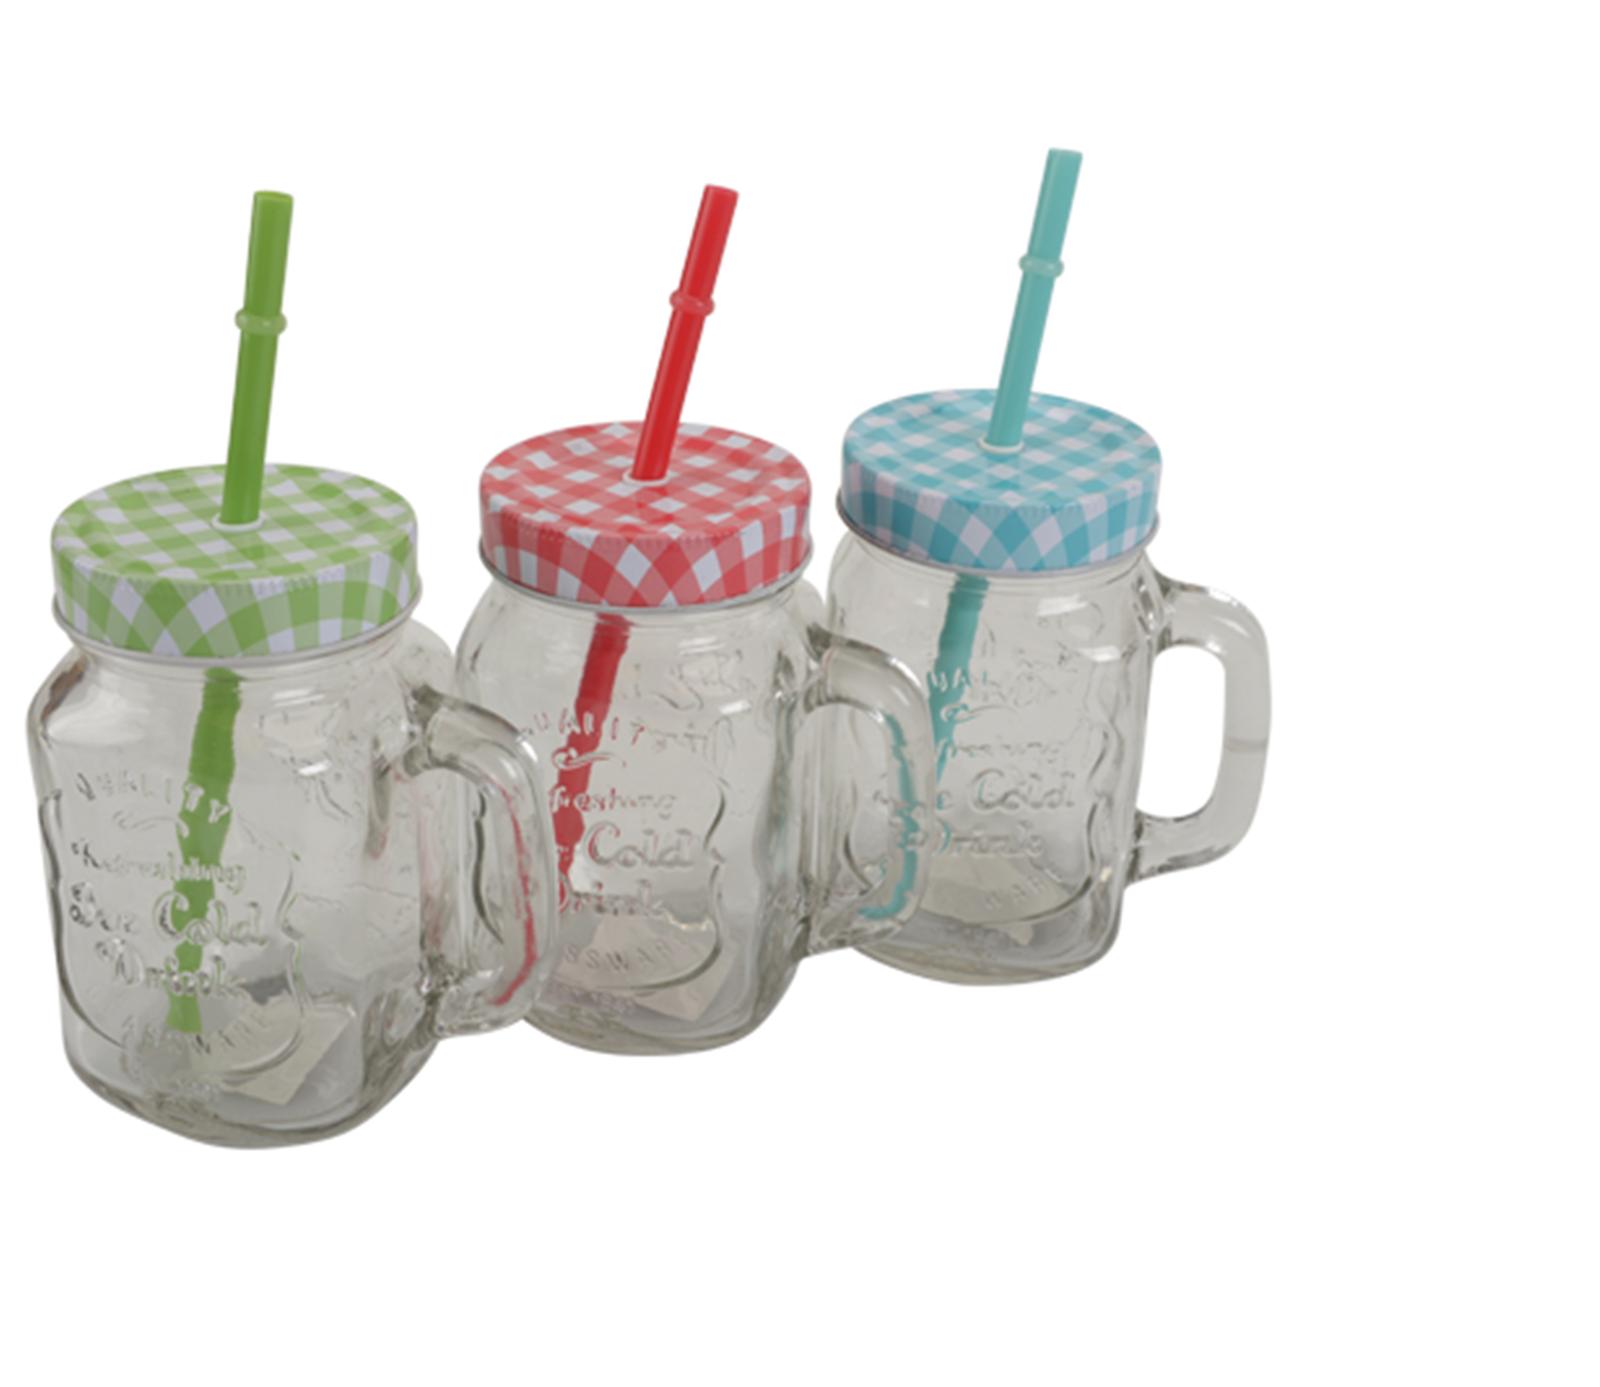 3 farben trinkglas henkel deckel trinkhalm trinkbecher for Deckel trinkglas